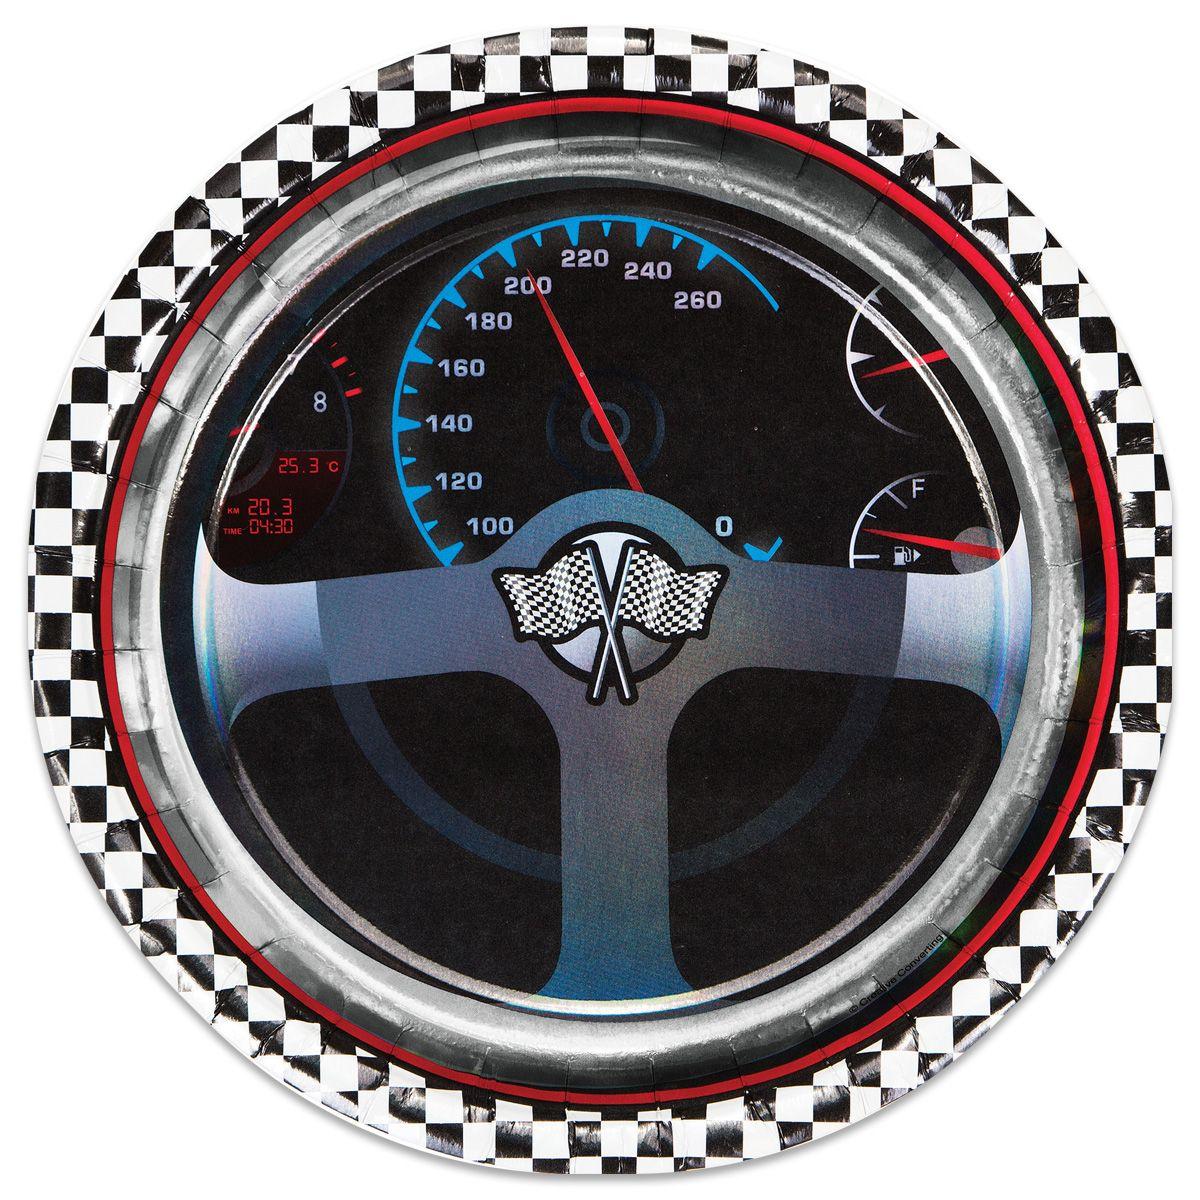 "Car Racing Plates - 8 3/4"""" - 8 Per Unit"" PAP5974DPUN"